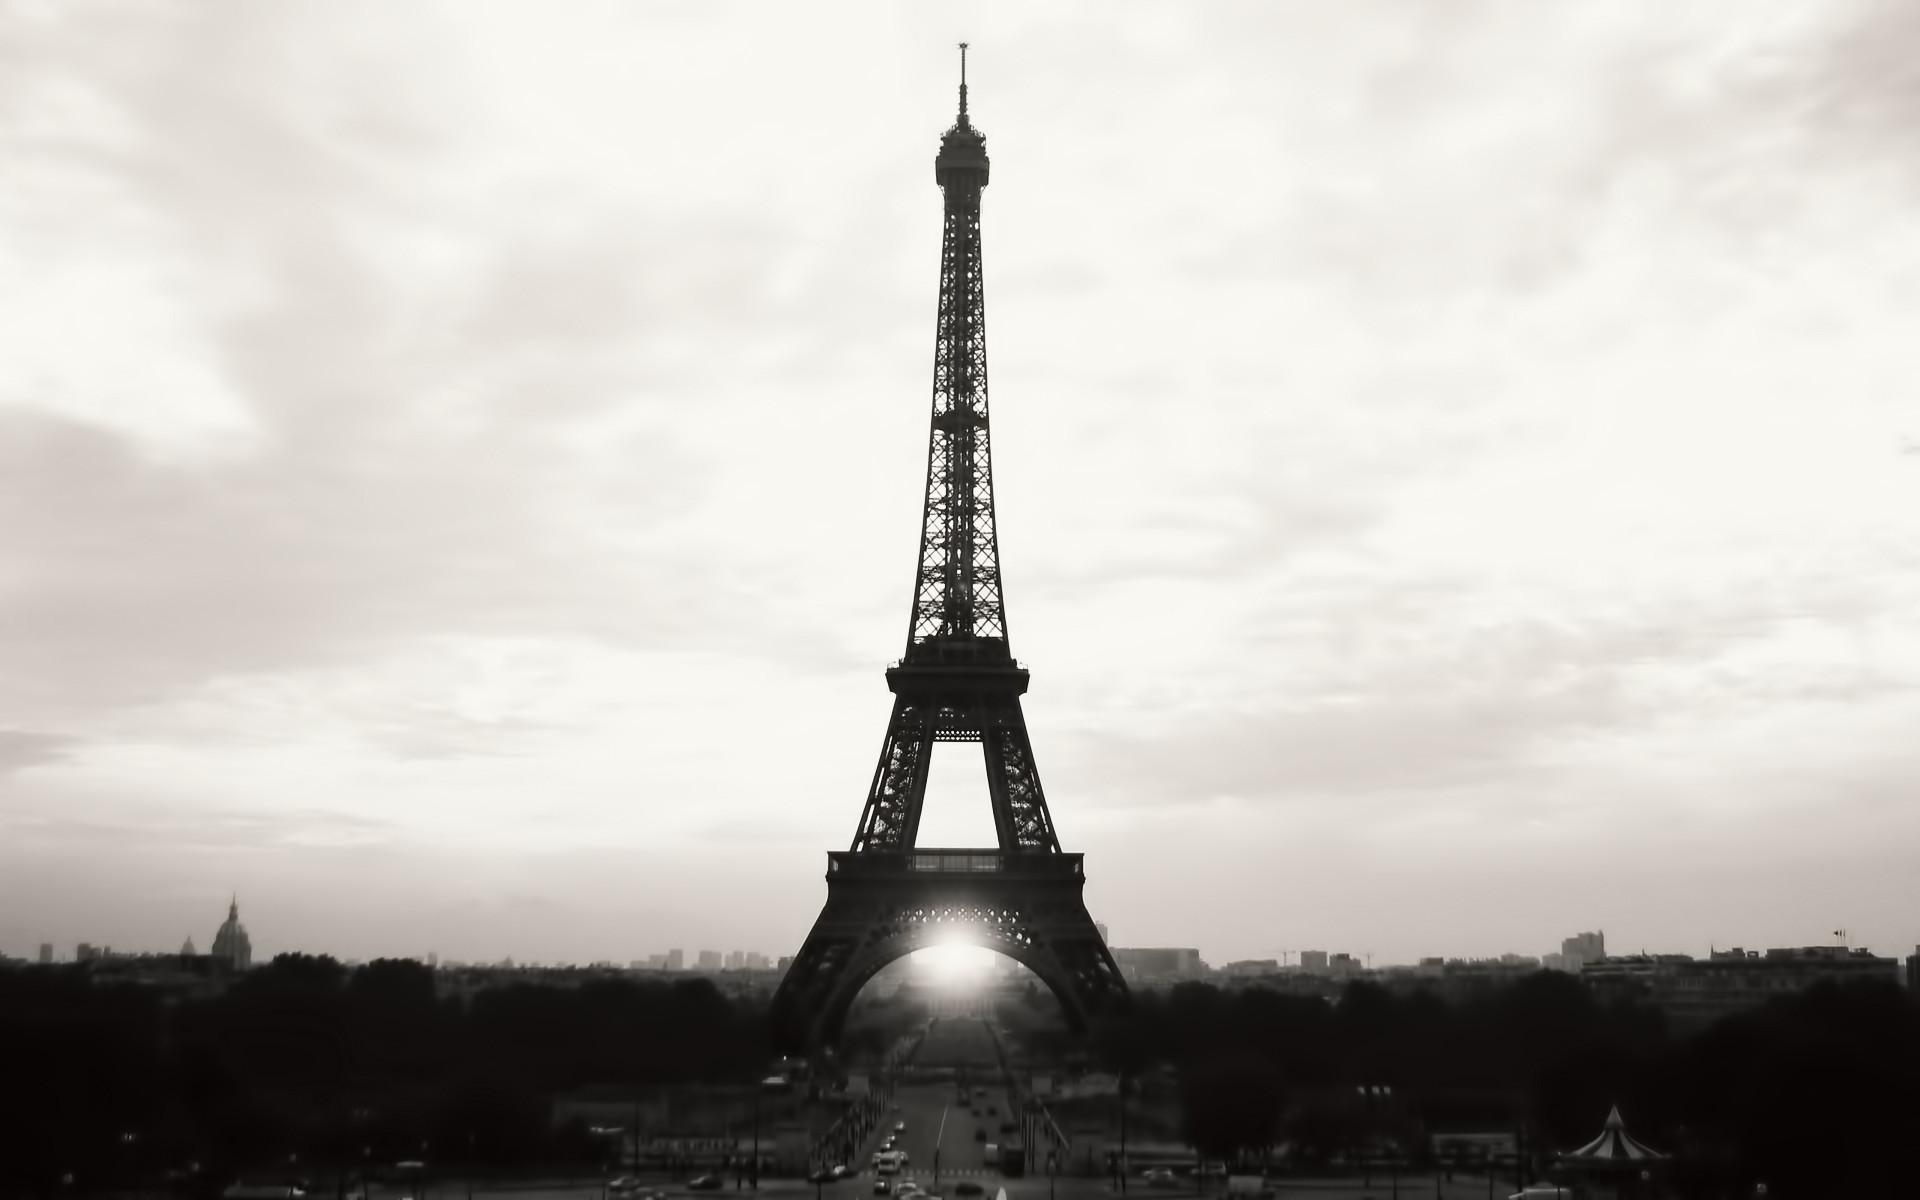 Eiffel Tower Paris Black and White Photography Desktop Wallpaper